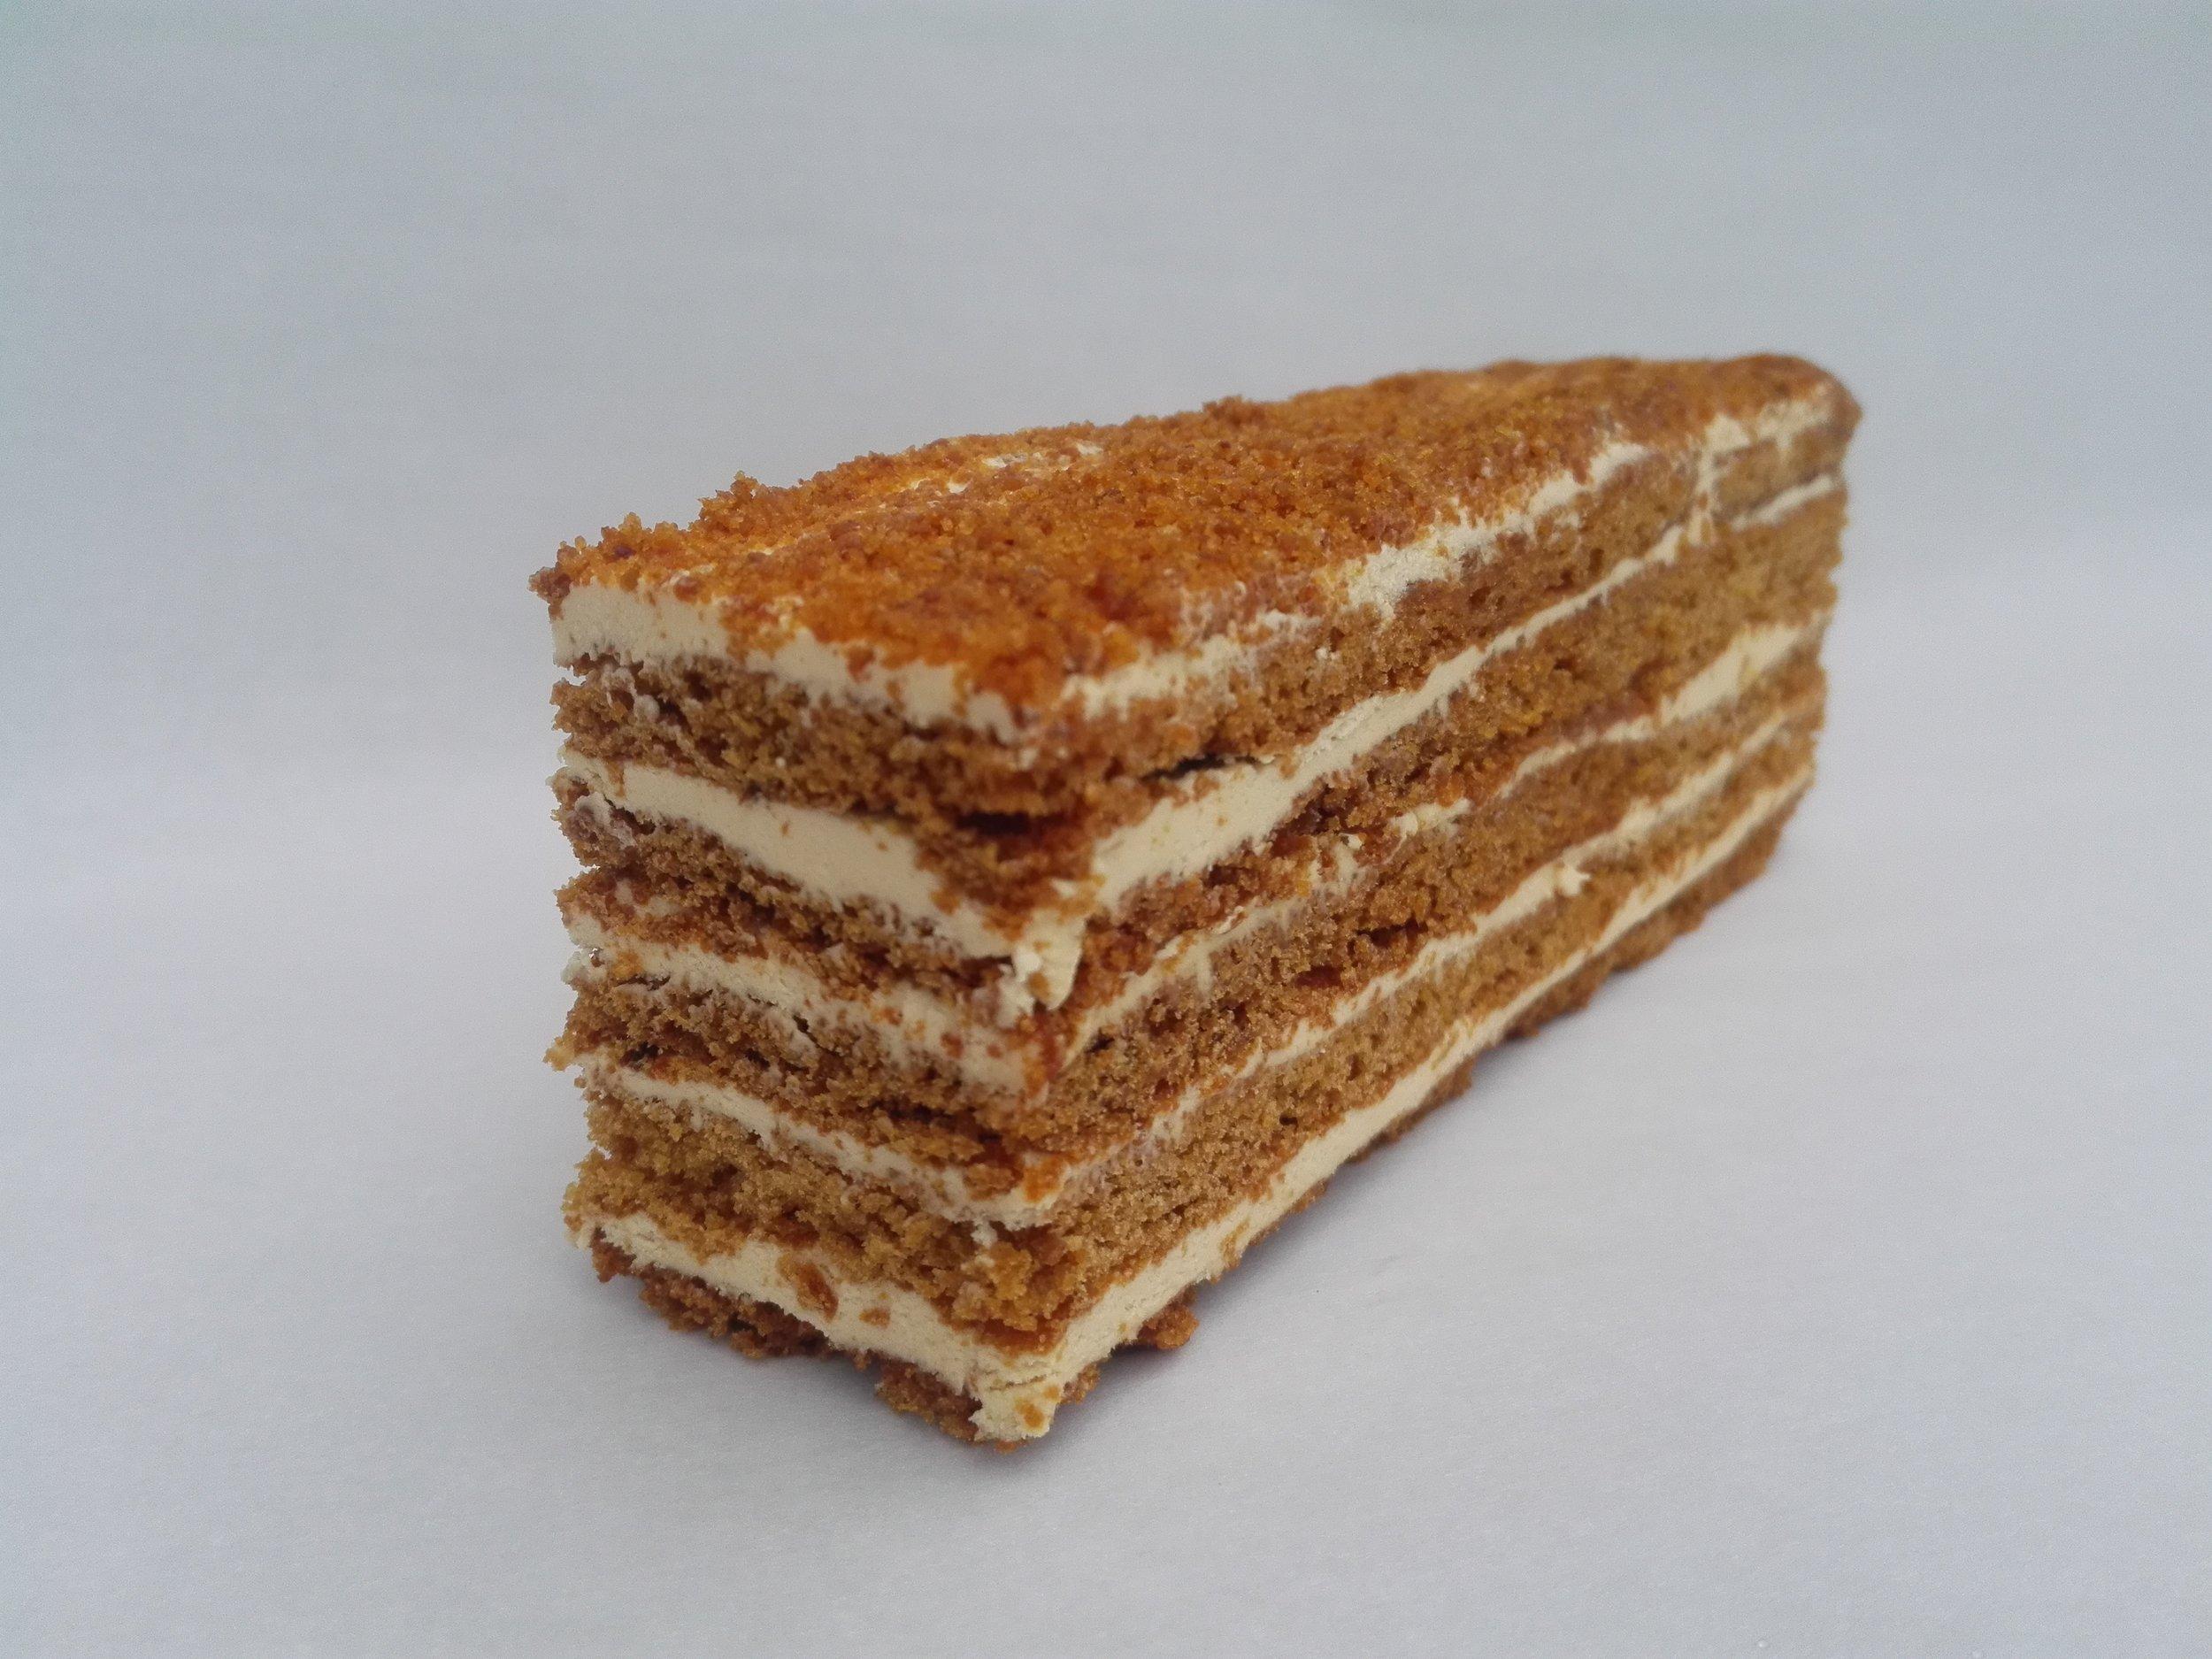 Russian_Honey_Cake_Russian_Pies.png